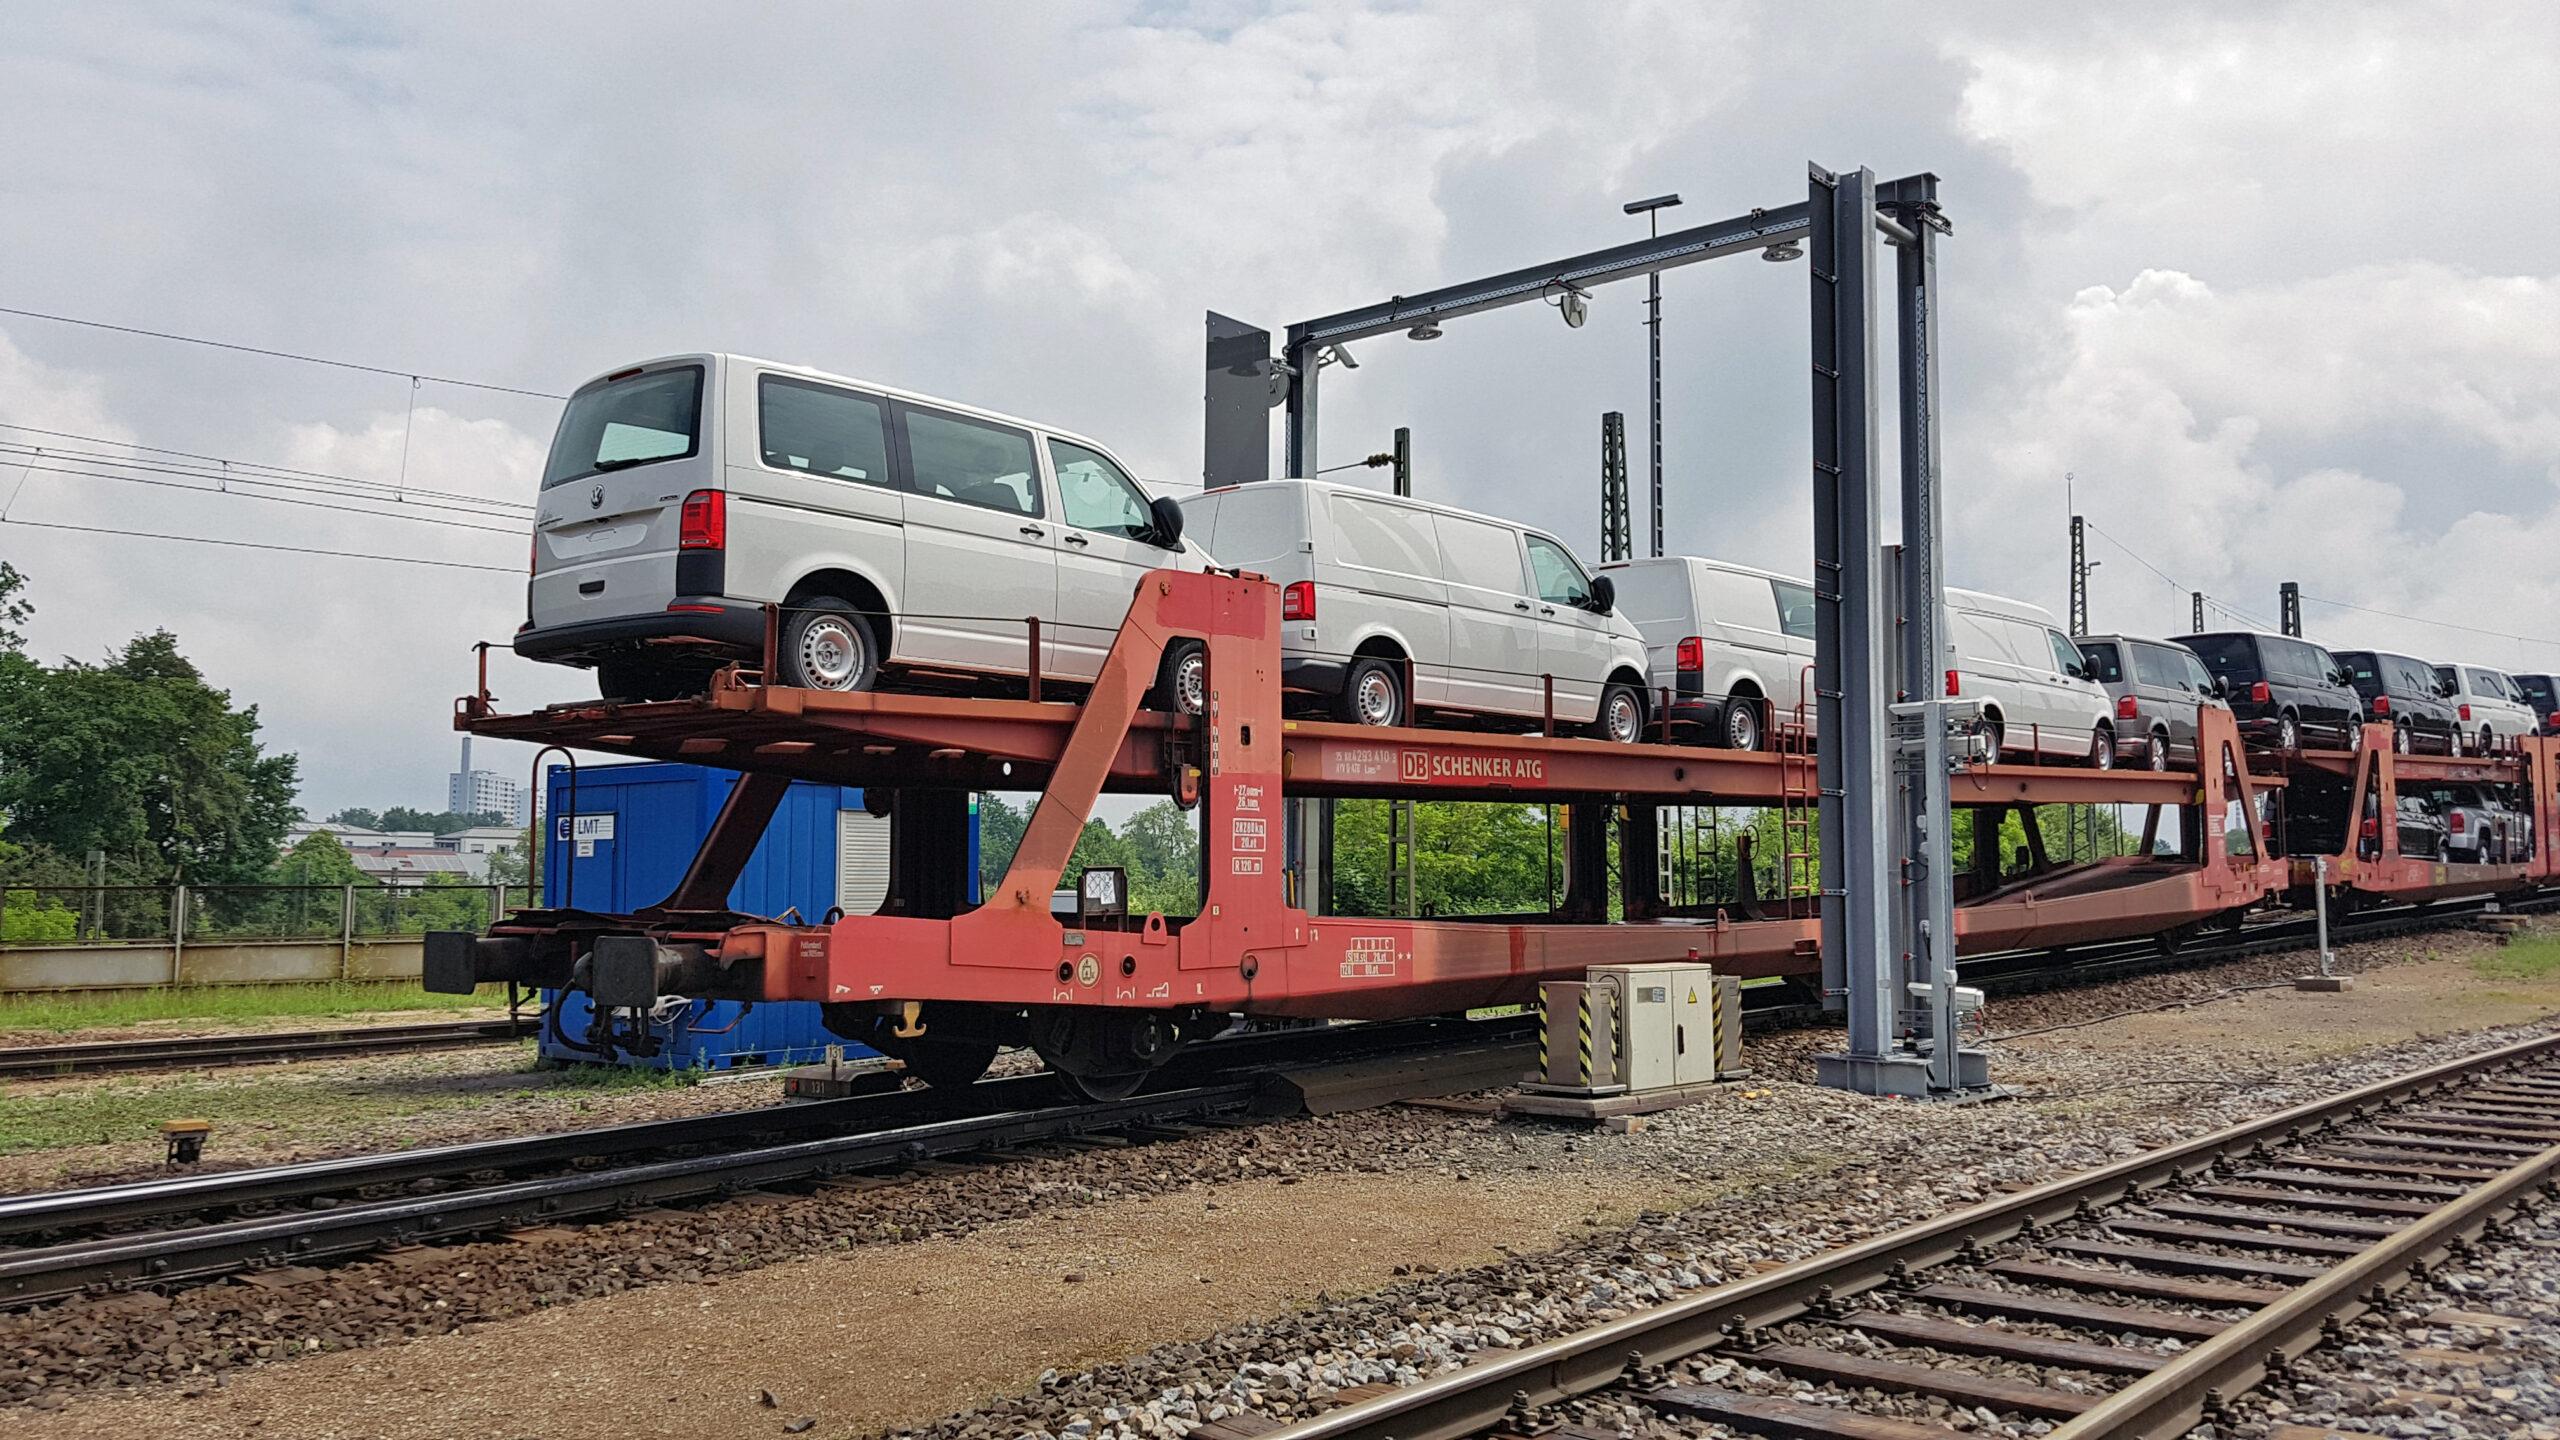 Intelligent camera bridge inspects freight cars